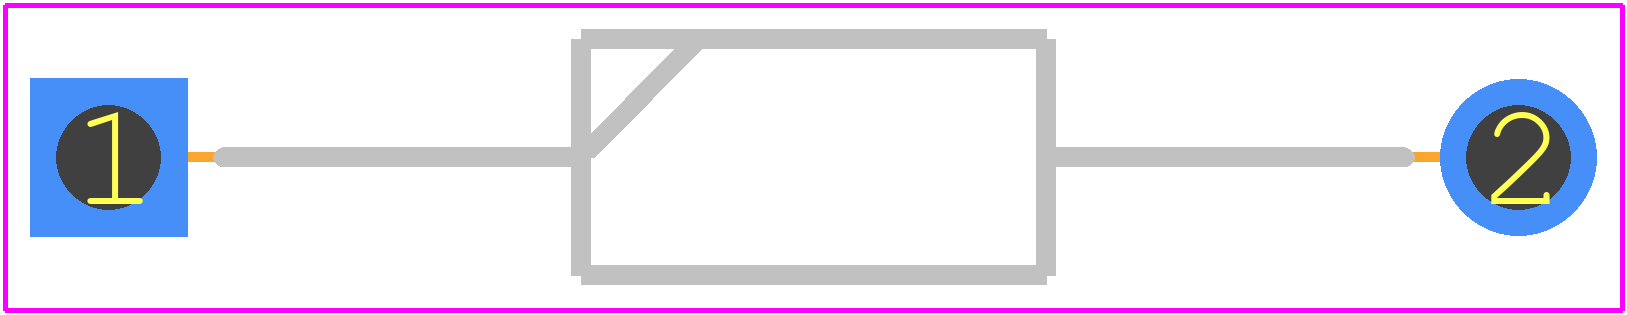 1N4001-E3/54 - Vishay PCB footprint - Diodes, Axial Diameter Horizontal Mounting - DO-204AL (DO-41)